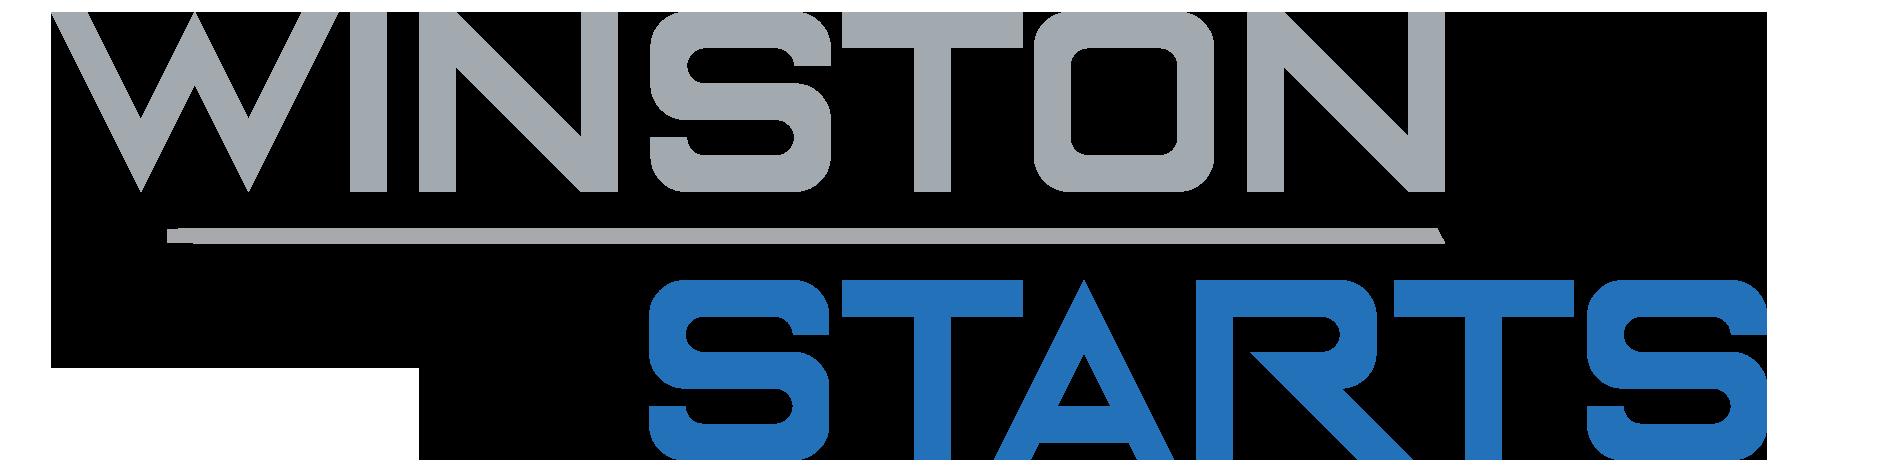 Winston Starts Logo